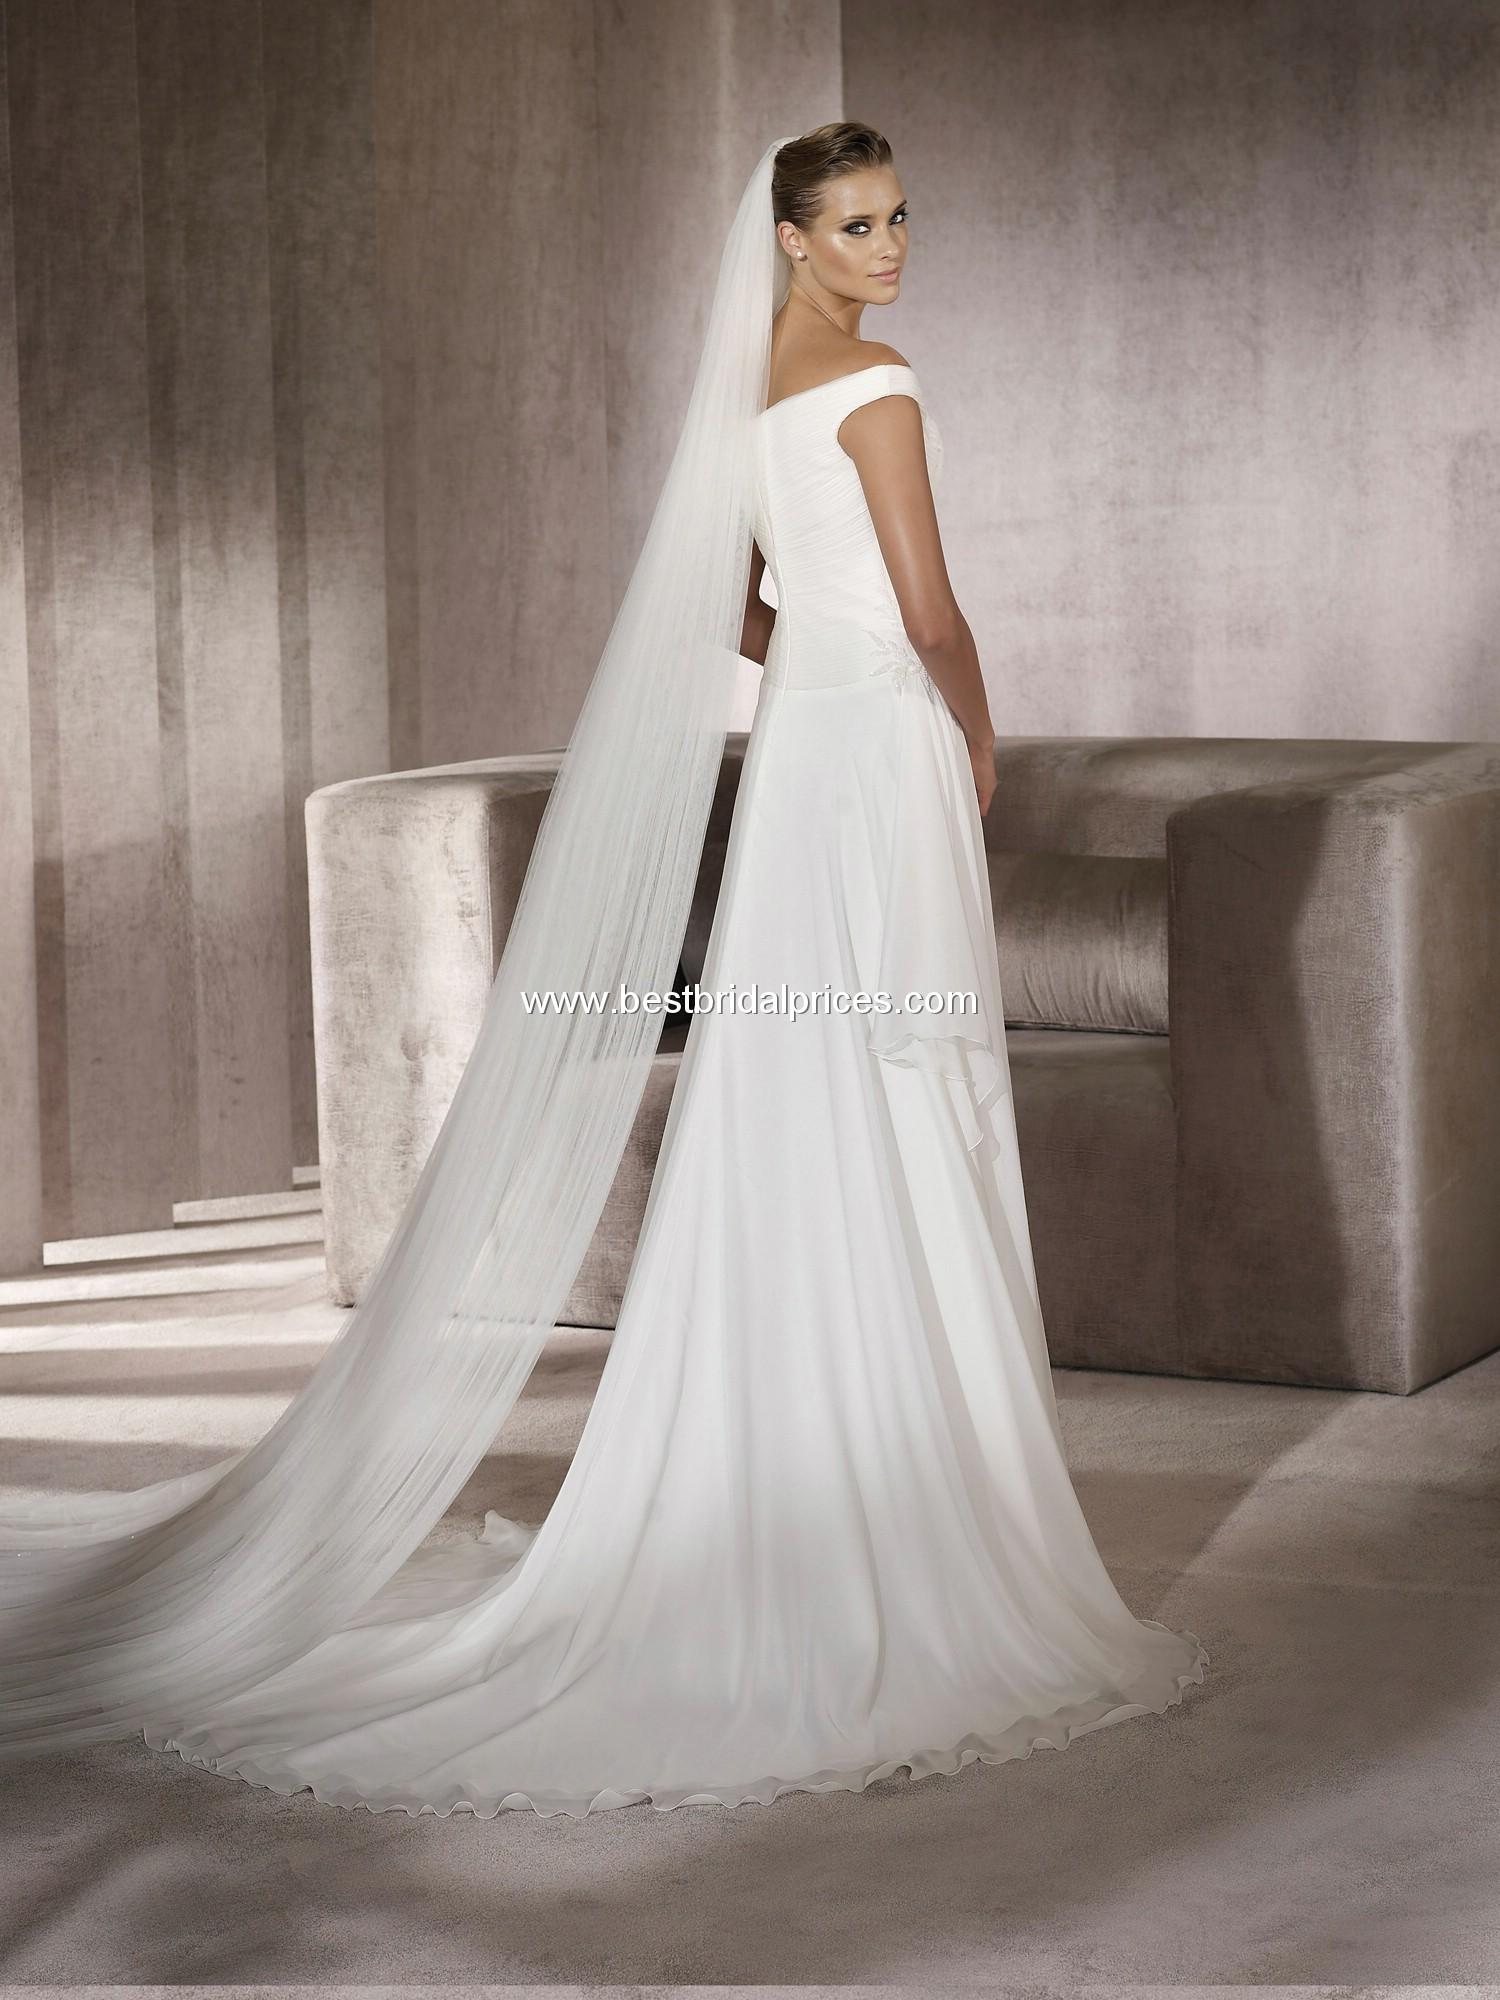 pronovias wedding dresses prices photo - 1